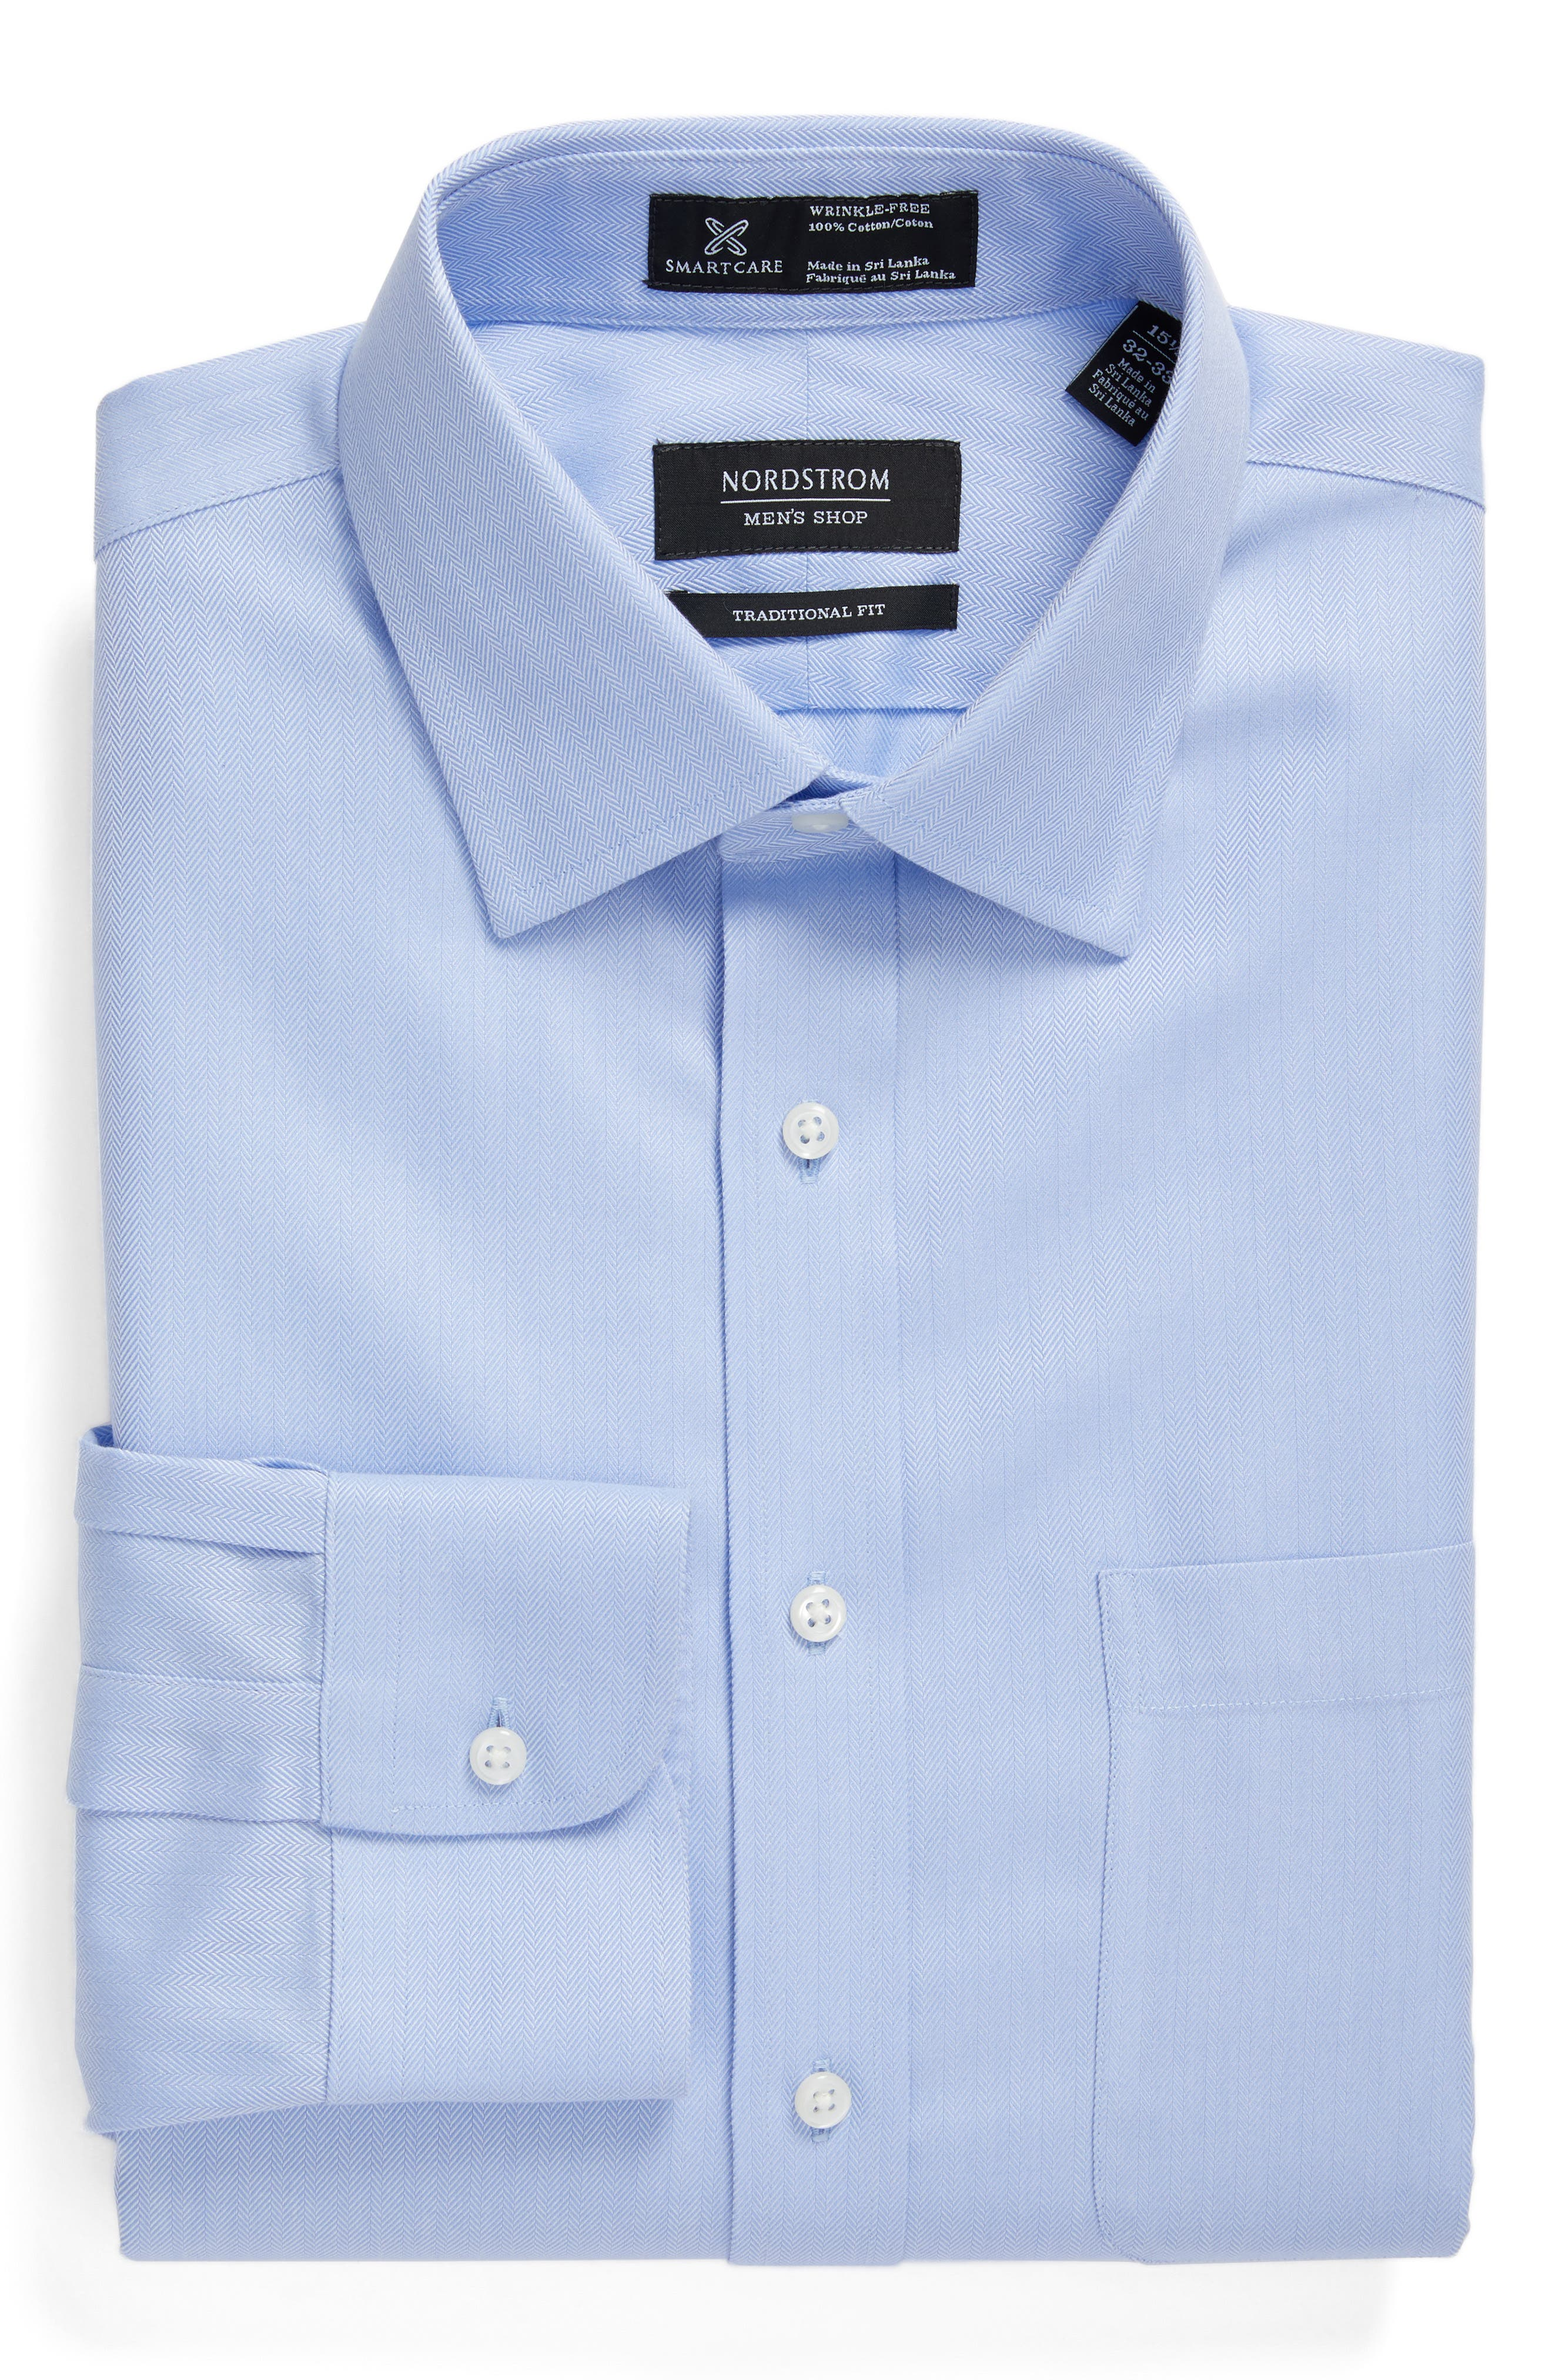 Nordstrom Men's Shop Smartcare™ Traditional Fit Herringbone Dress Shirt